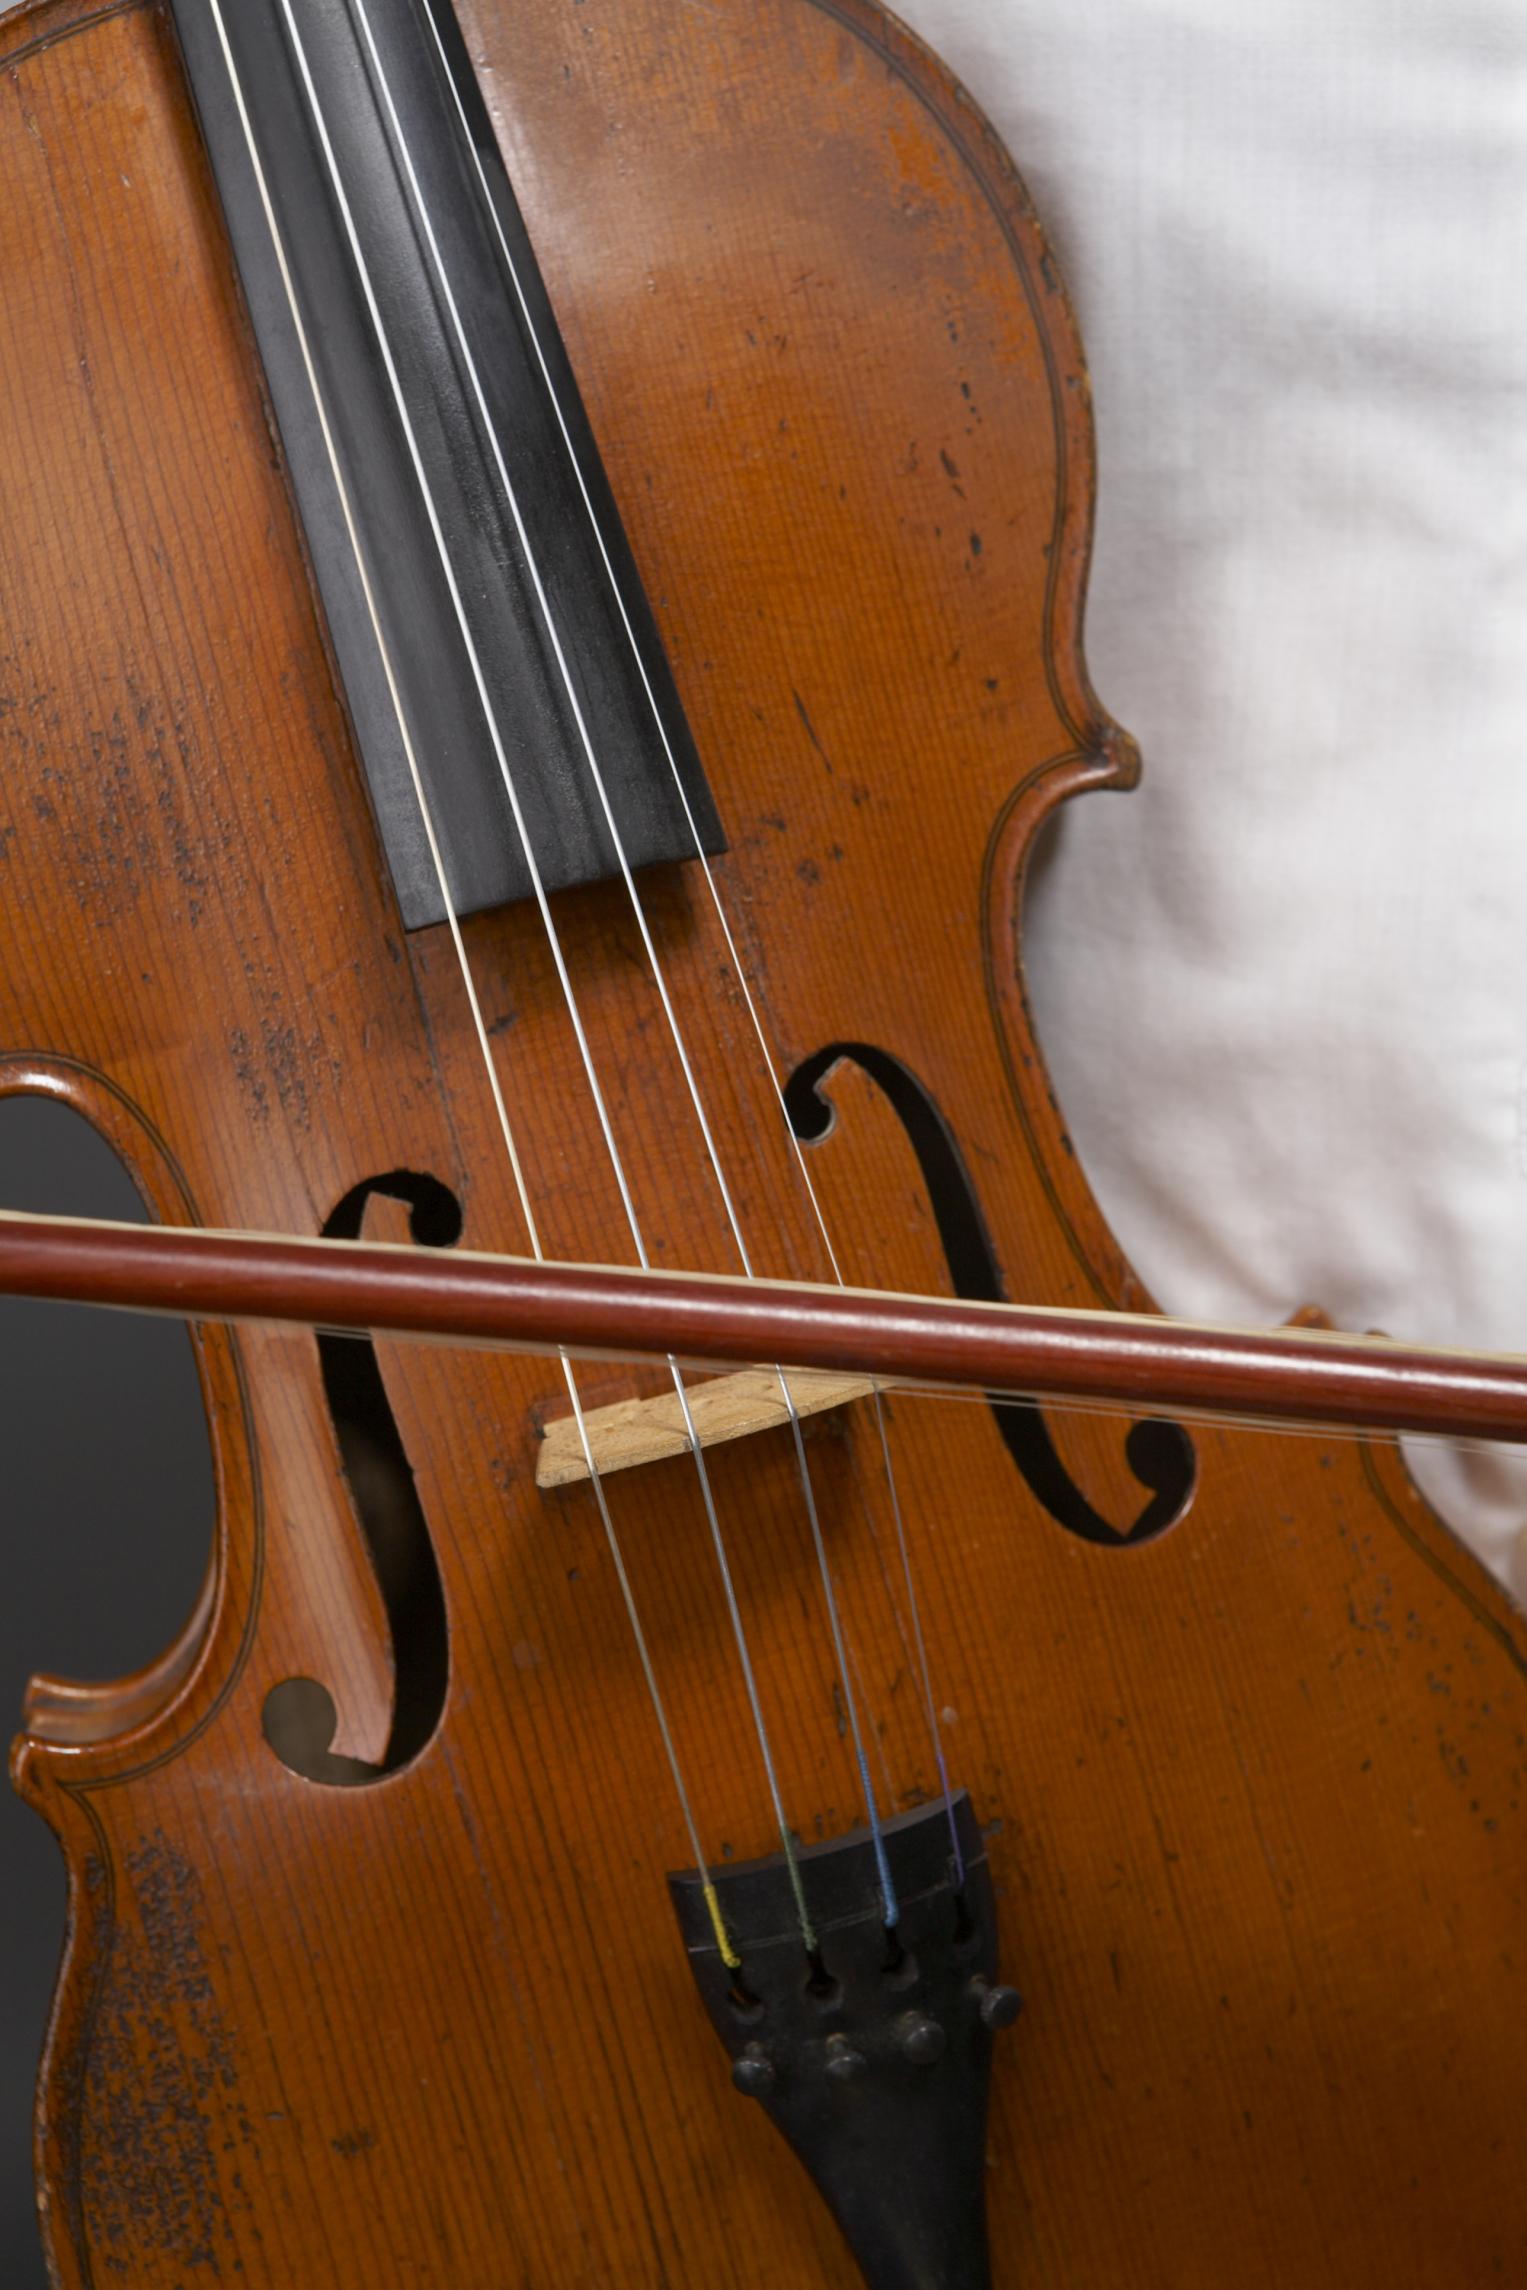 Homemade Violin That's Playable